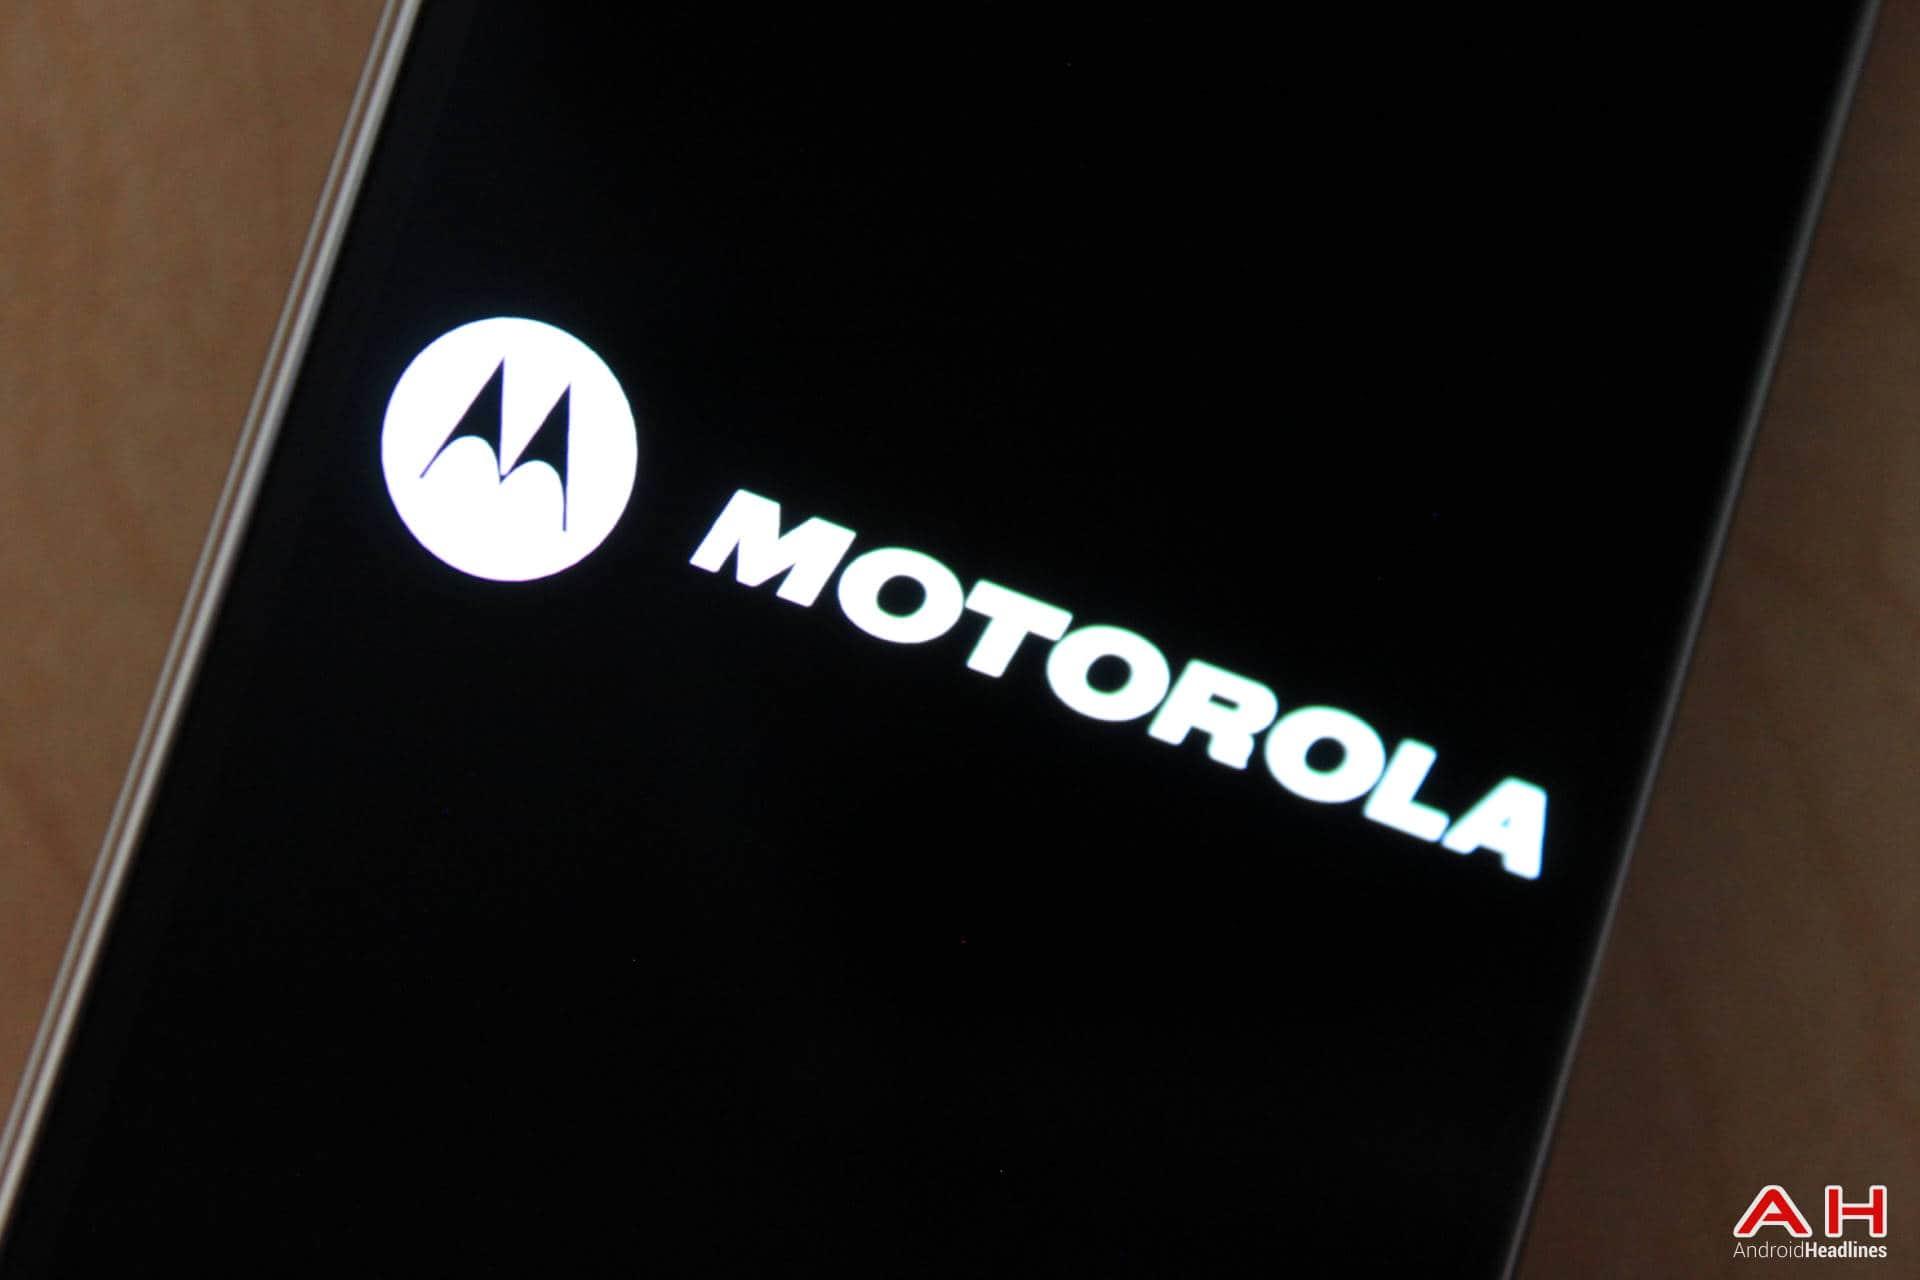 AH Motorola Logo 1.3